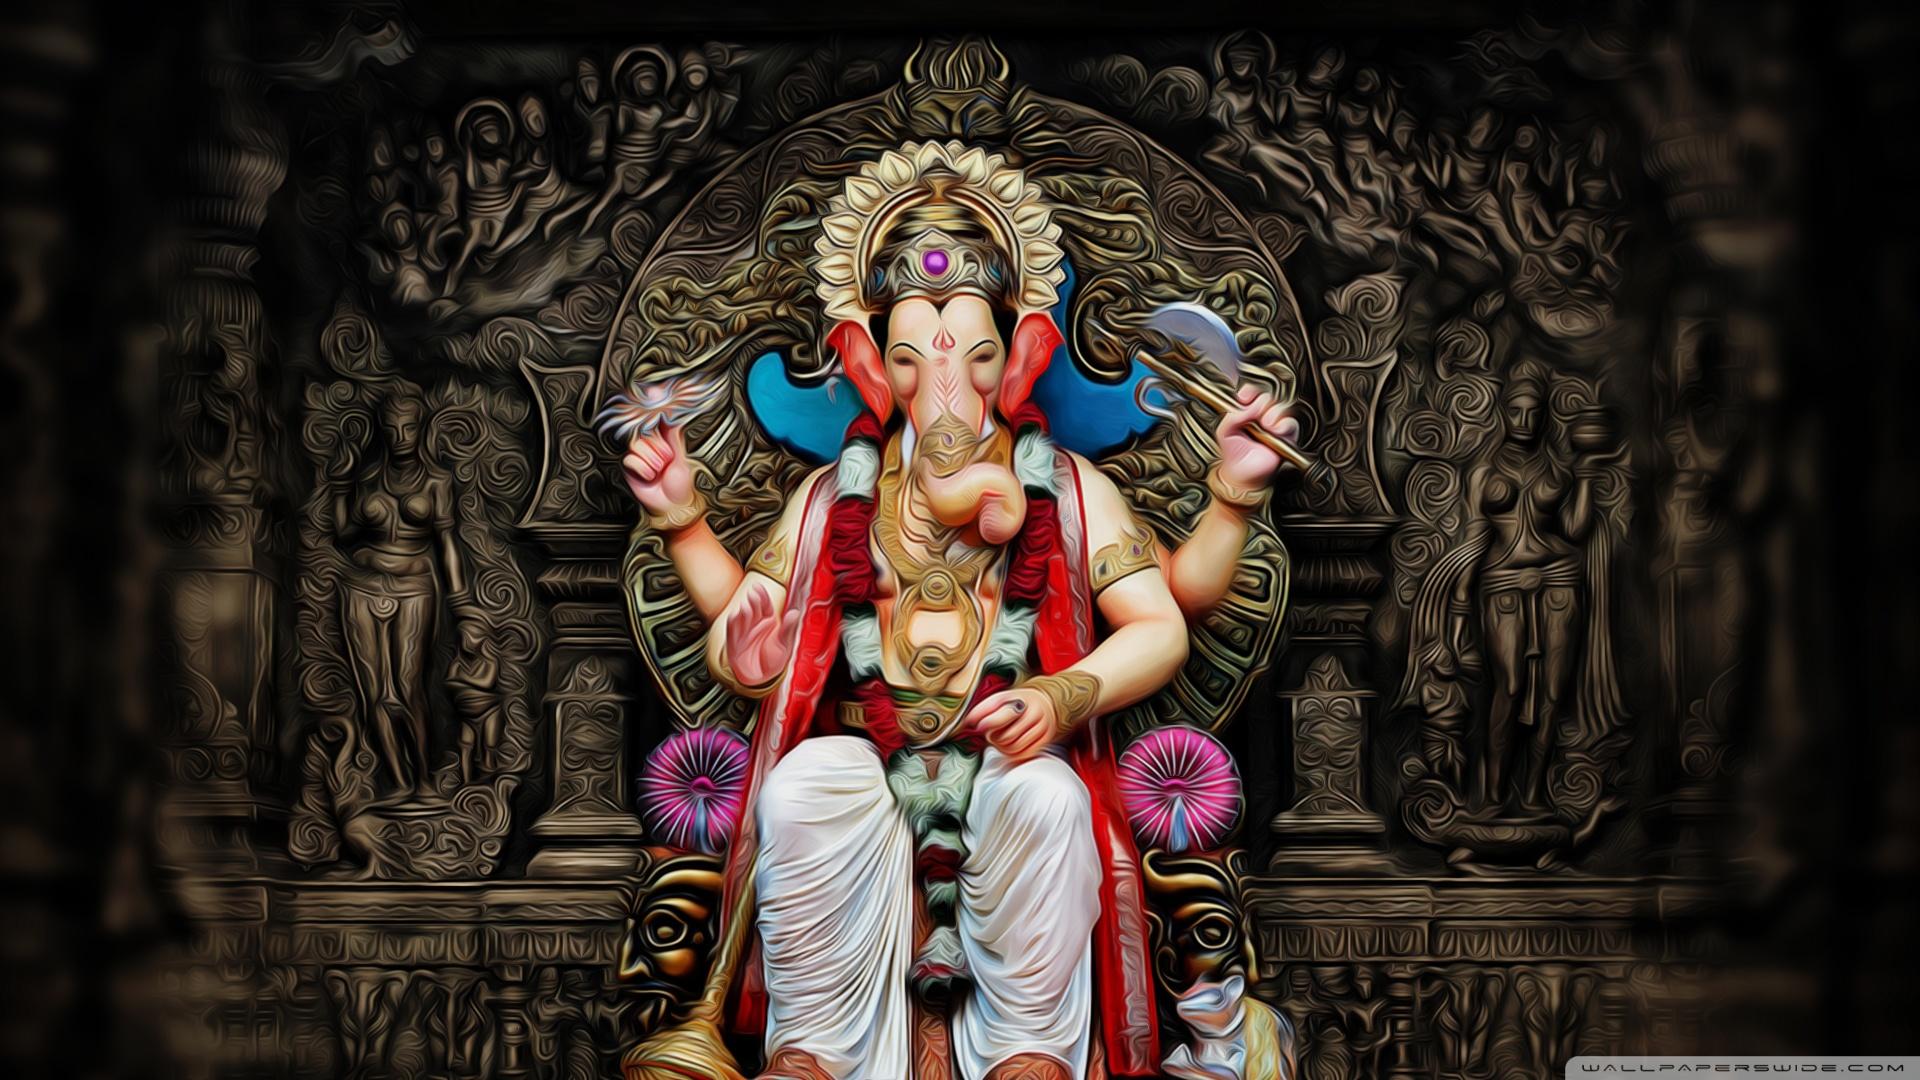 Siddhivinayak Hd Wallpaper Download Ganesha Ultra Hd Desktop Background Wallpaper For 4k Uhd